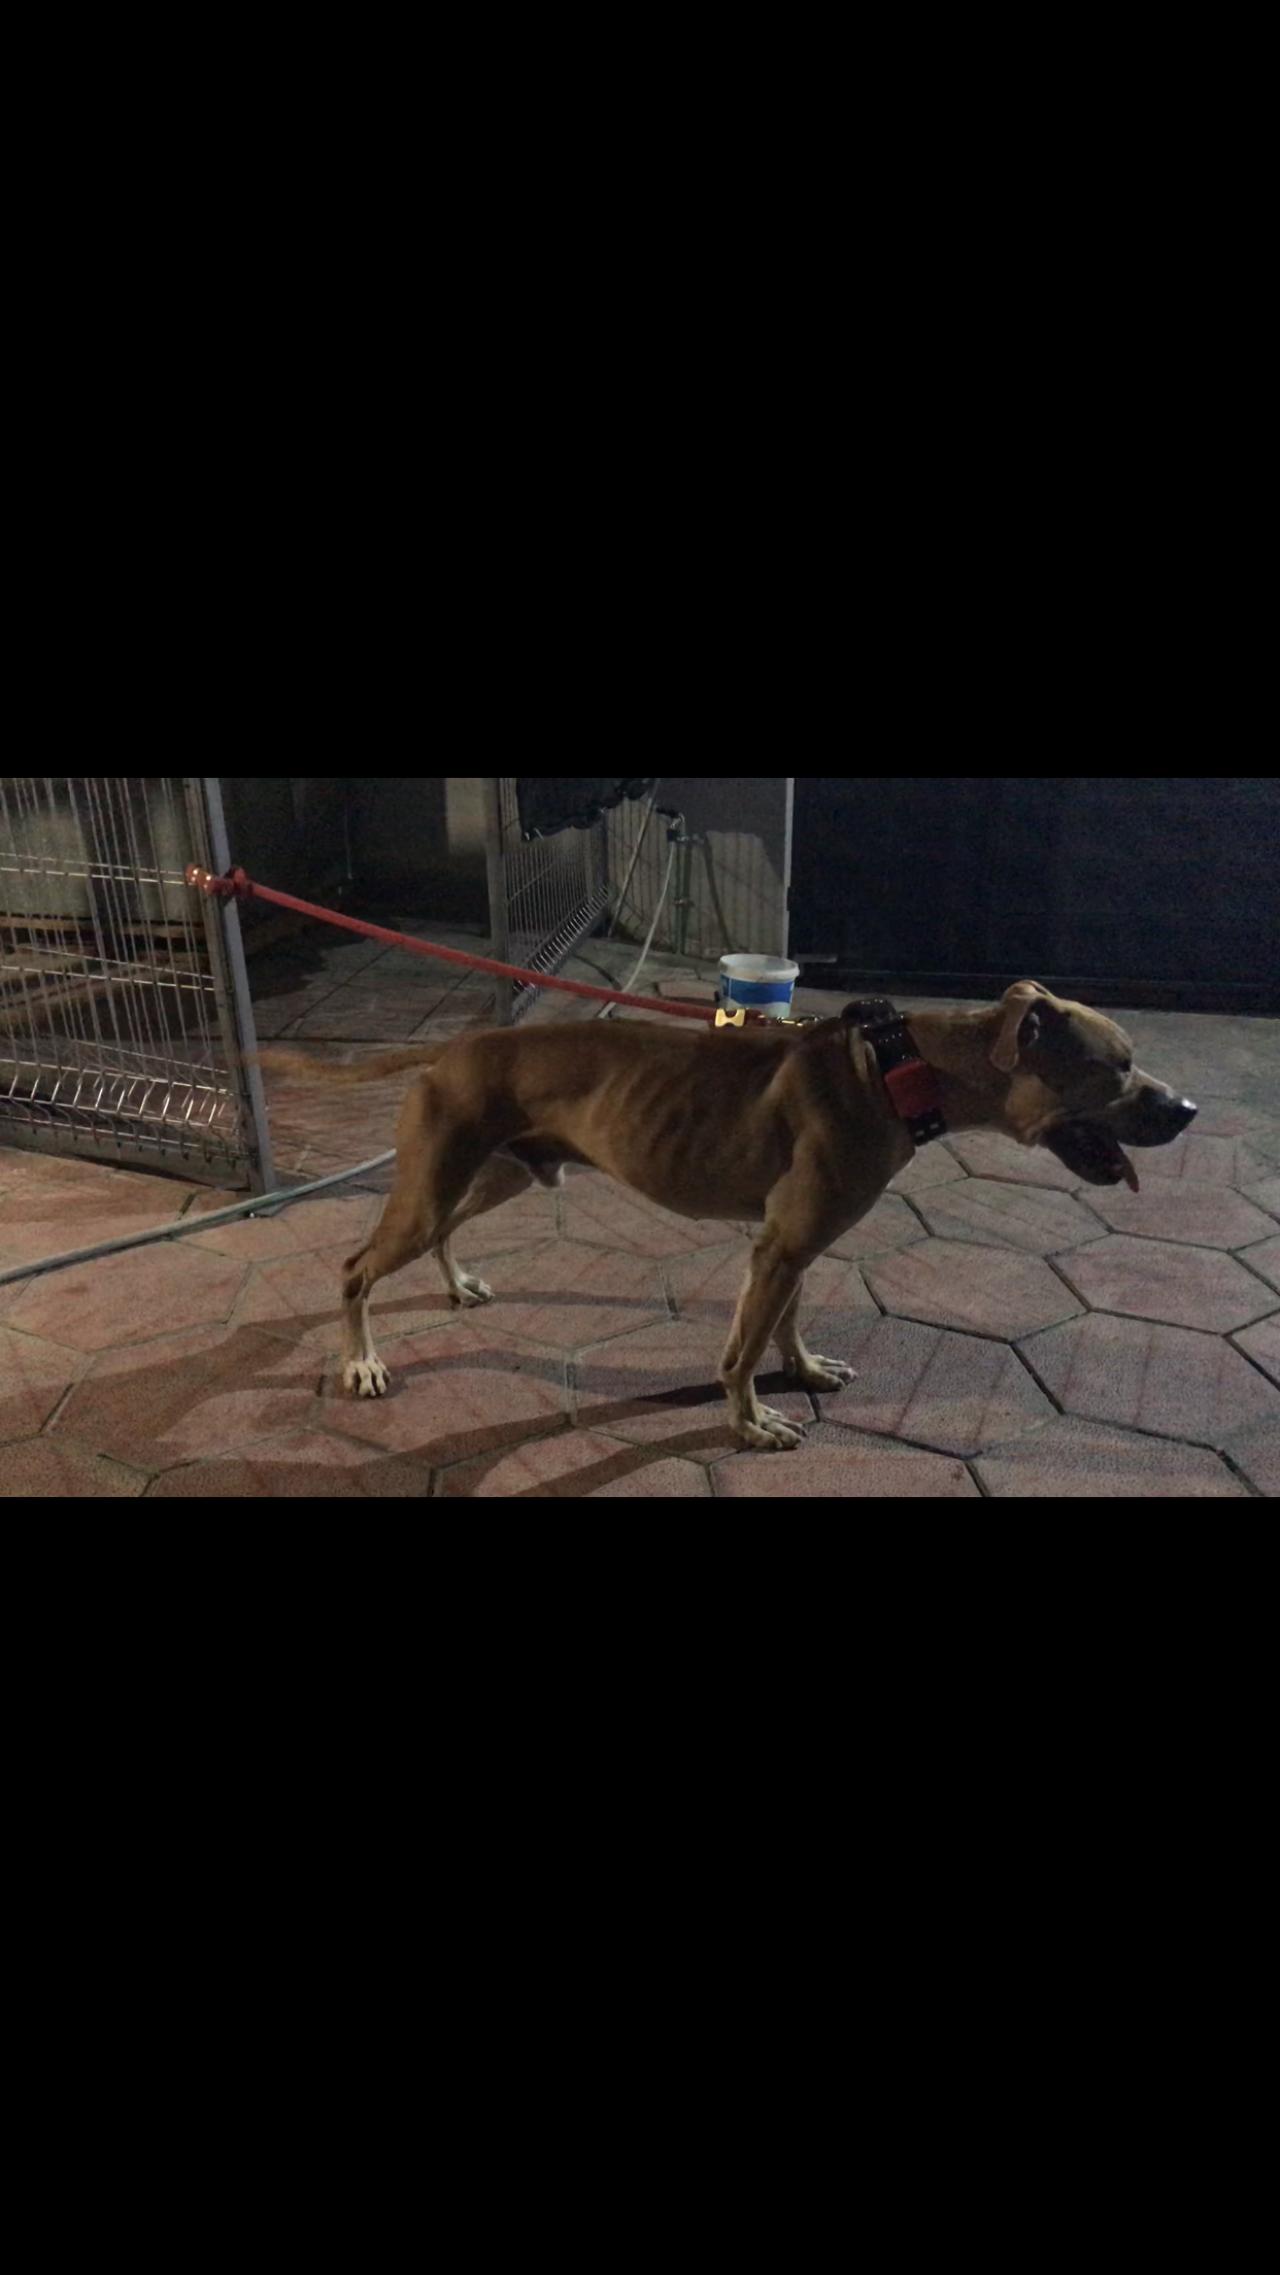 Pedigree Database: AL GAME DOGS & MONTENEGRO KENNELS SAJO'S BASTER